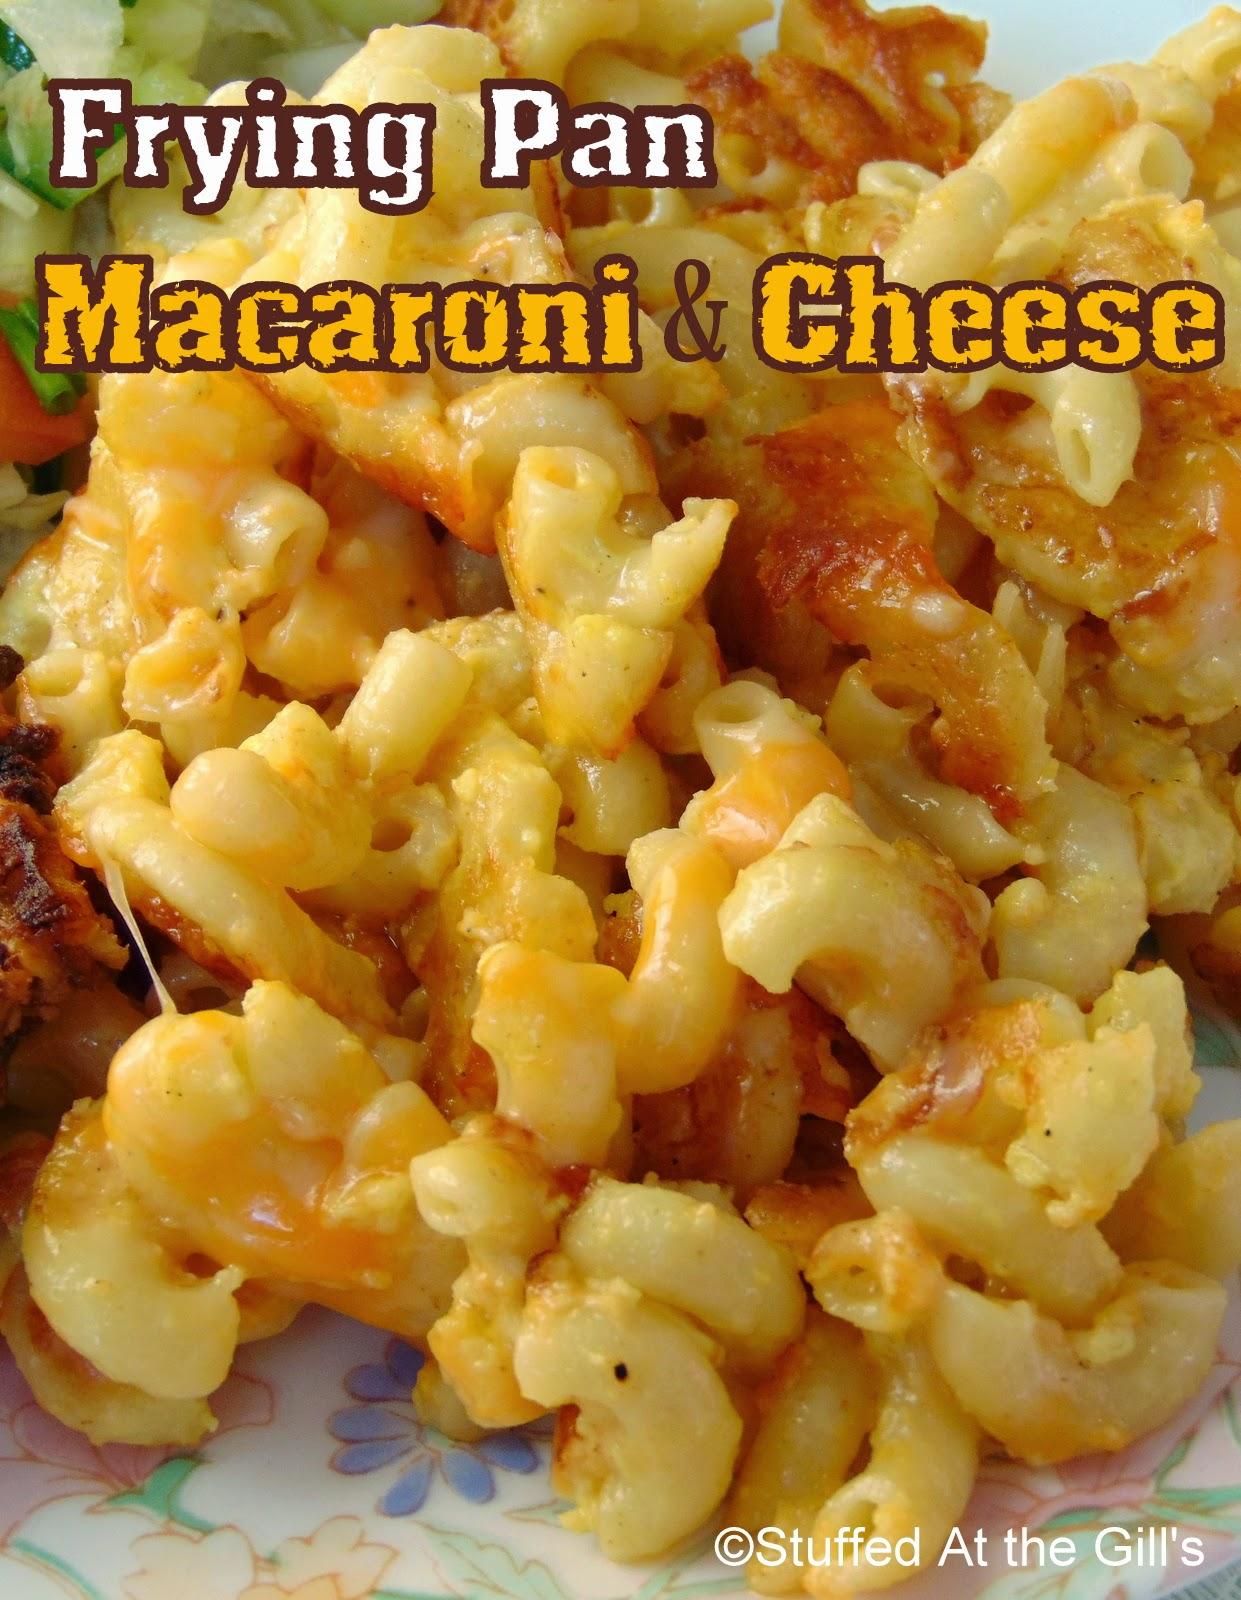 Frying Pan Macaroni and Cheese